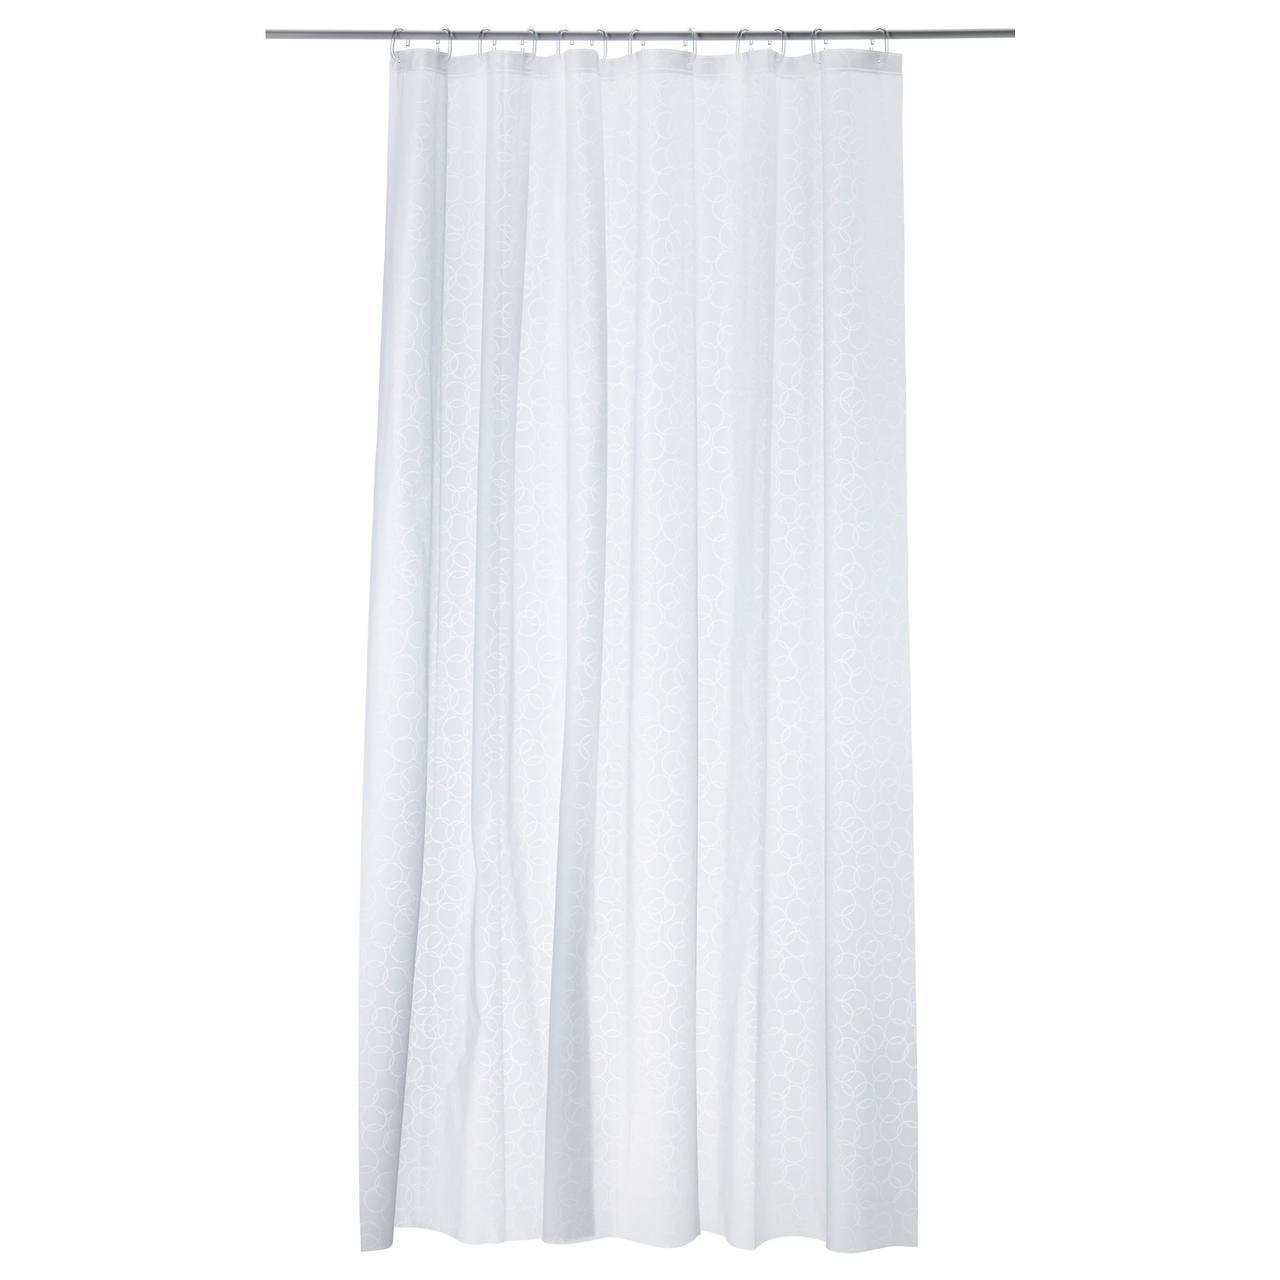 IKEA INNAREN (502.952.69) Занавес для душа, белый